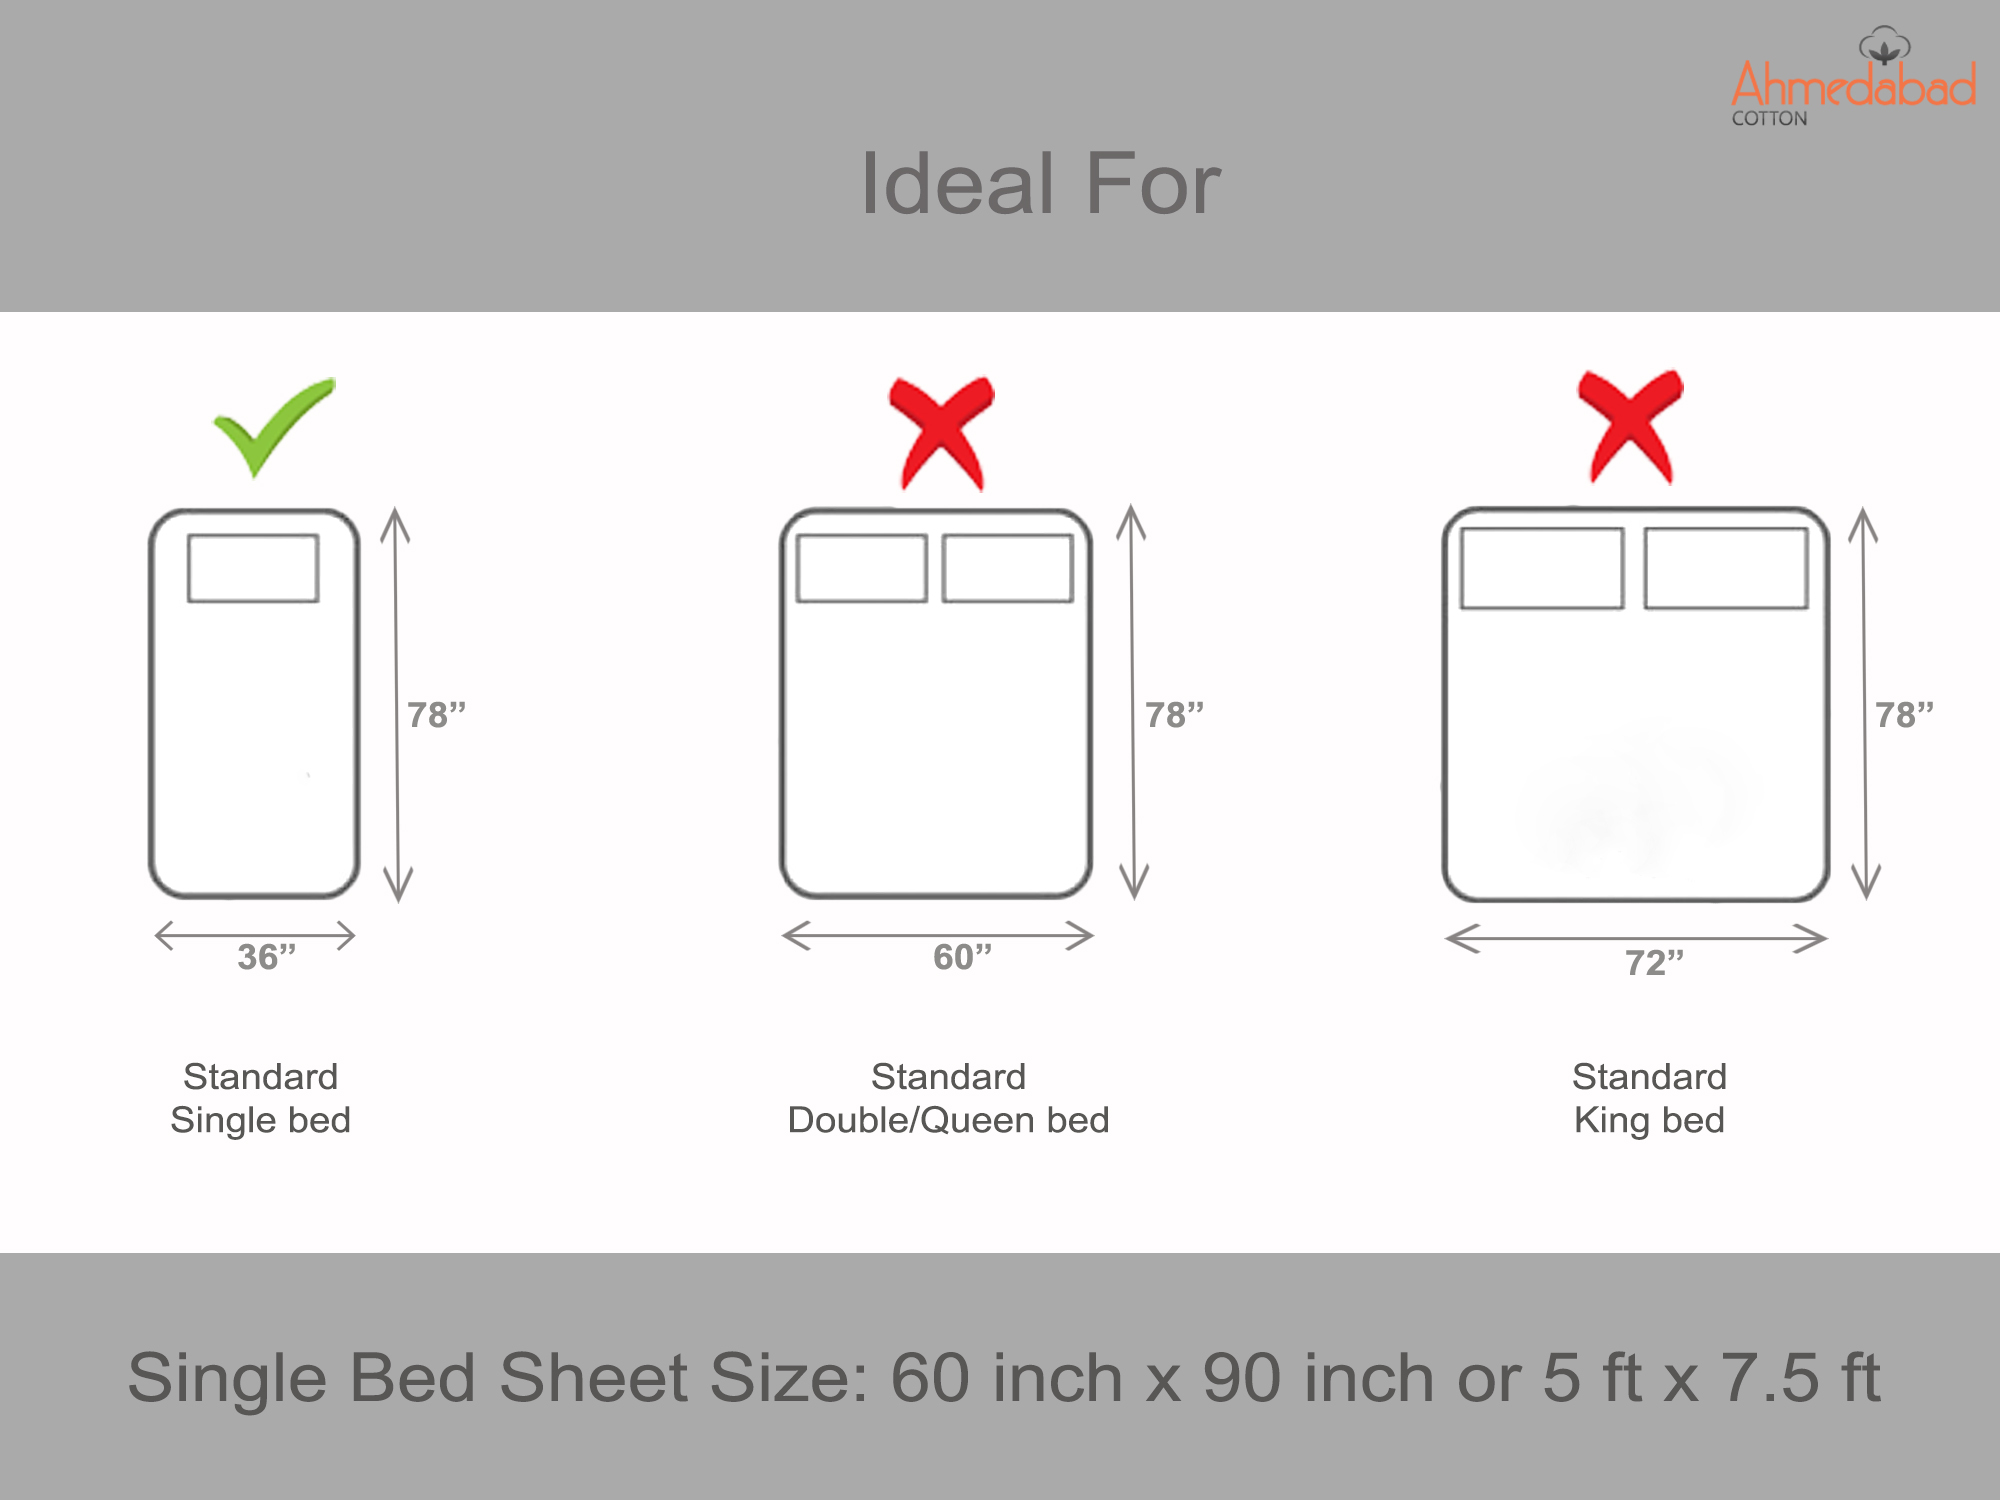 chhota bheem cotton single bedsheet multicolor ahmedabad cotton. Black Bedroom Furniture Sets. Home Design Ideas